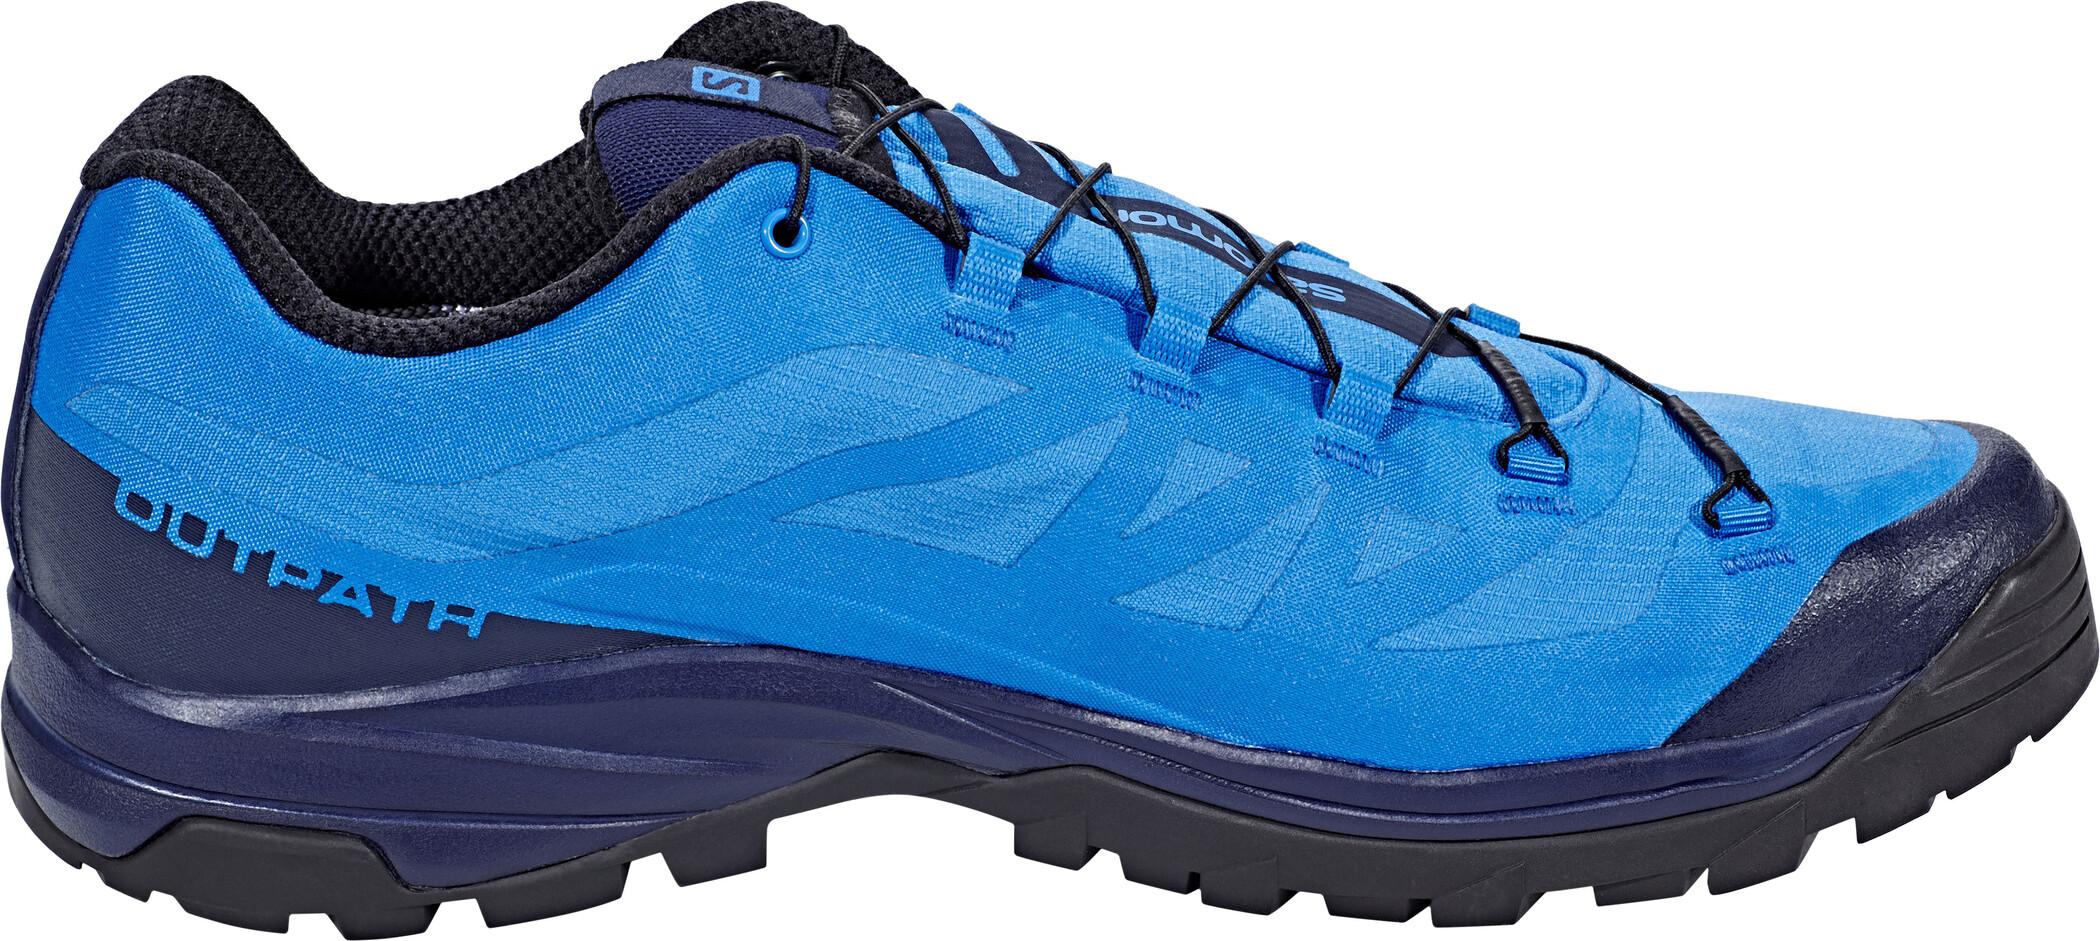 Salomon Outpath GTX Shoes Herr